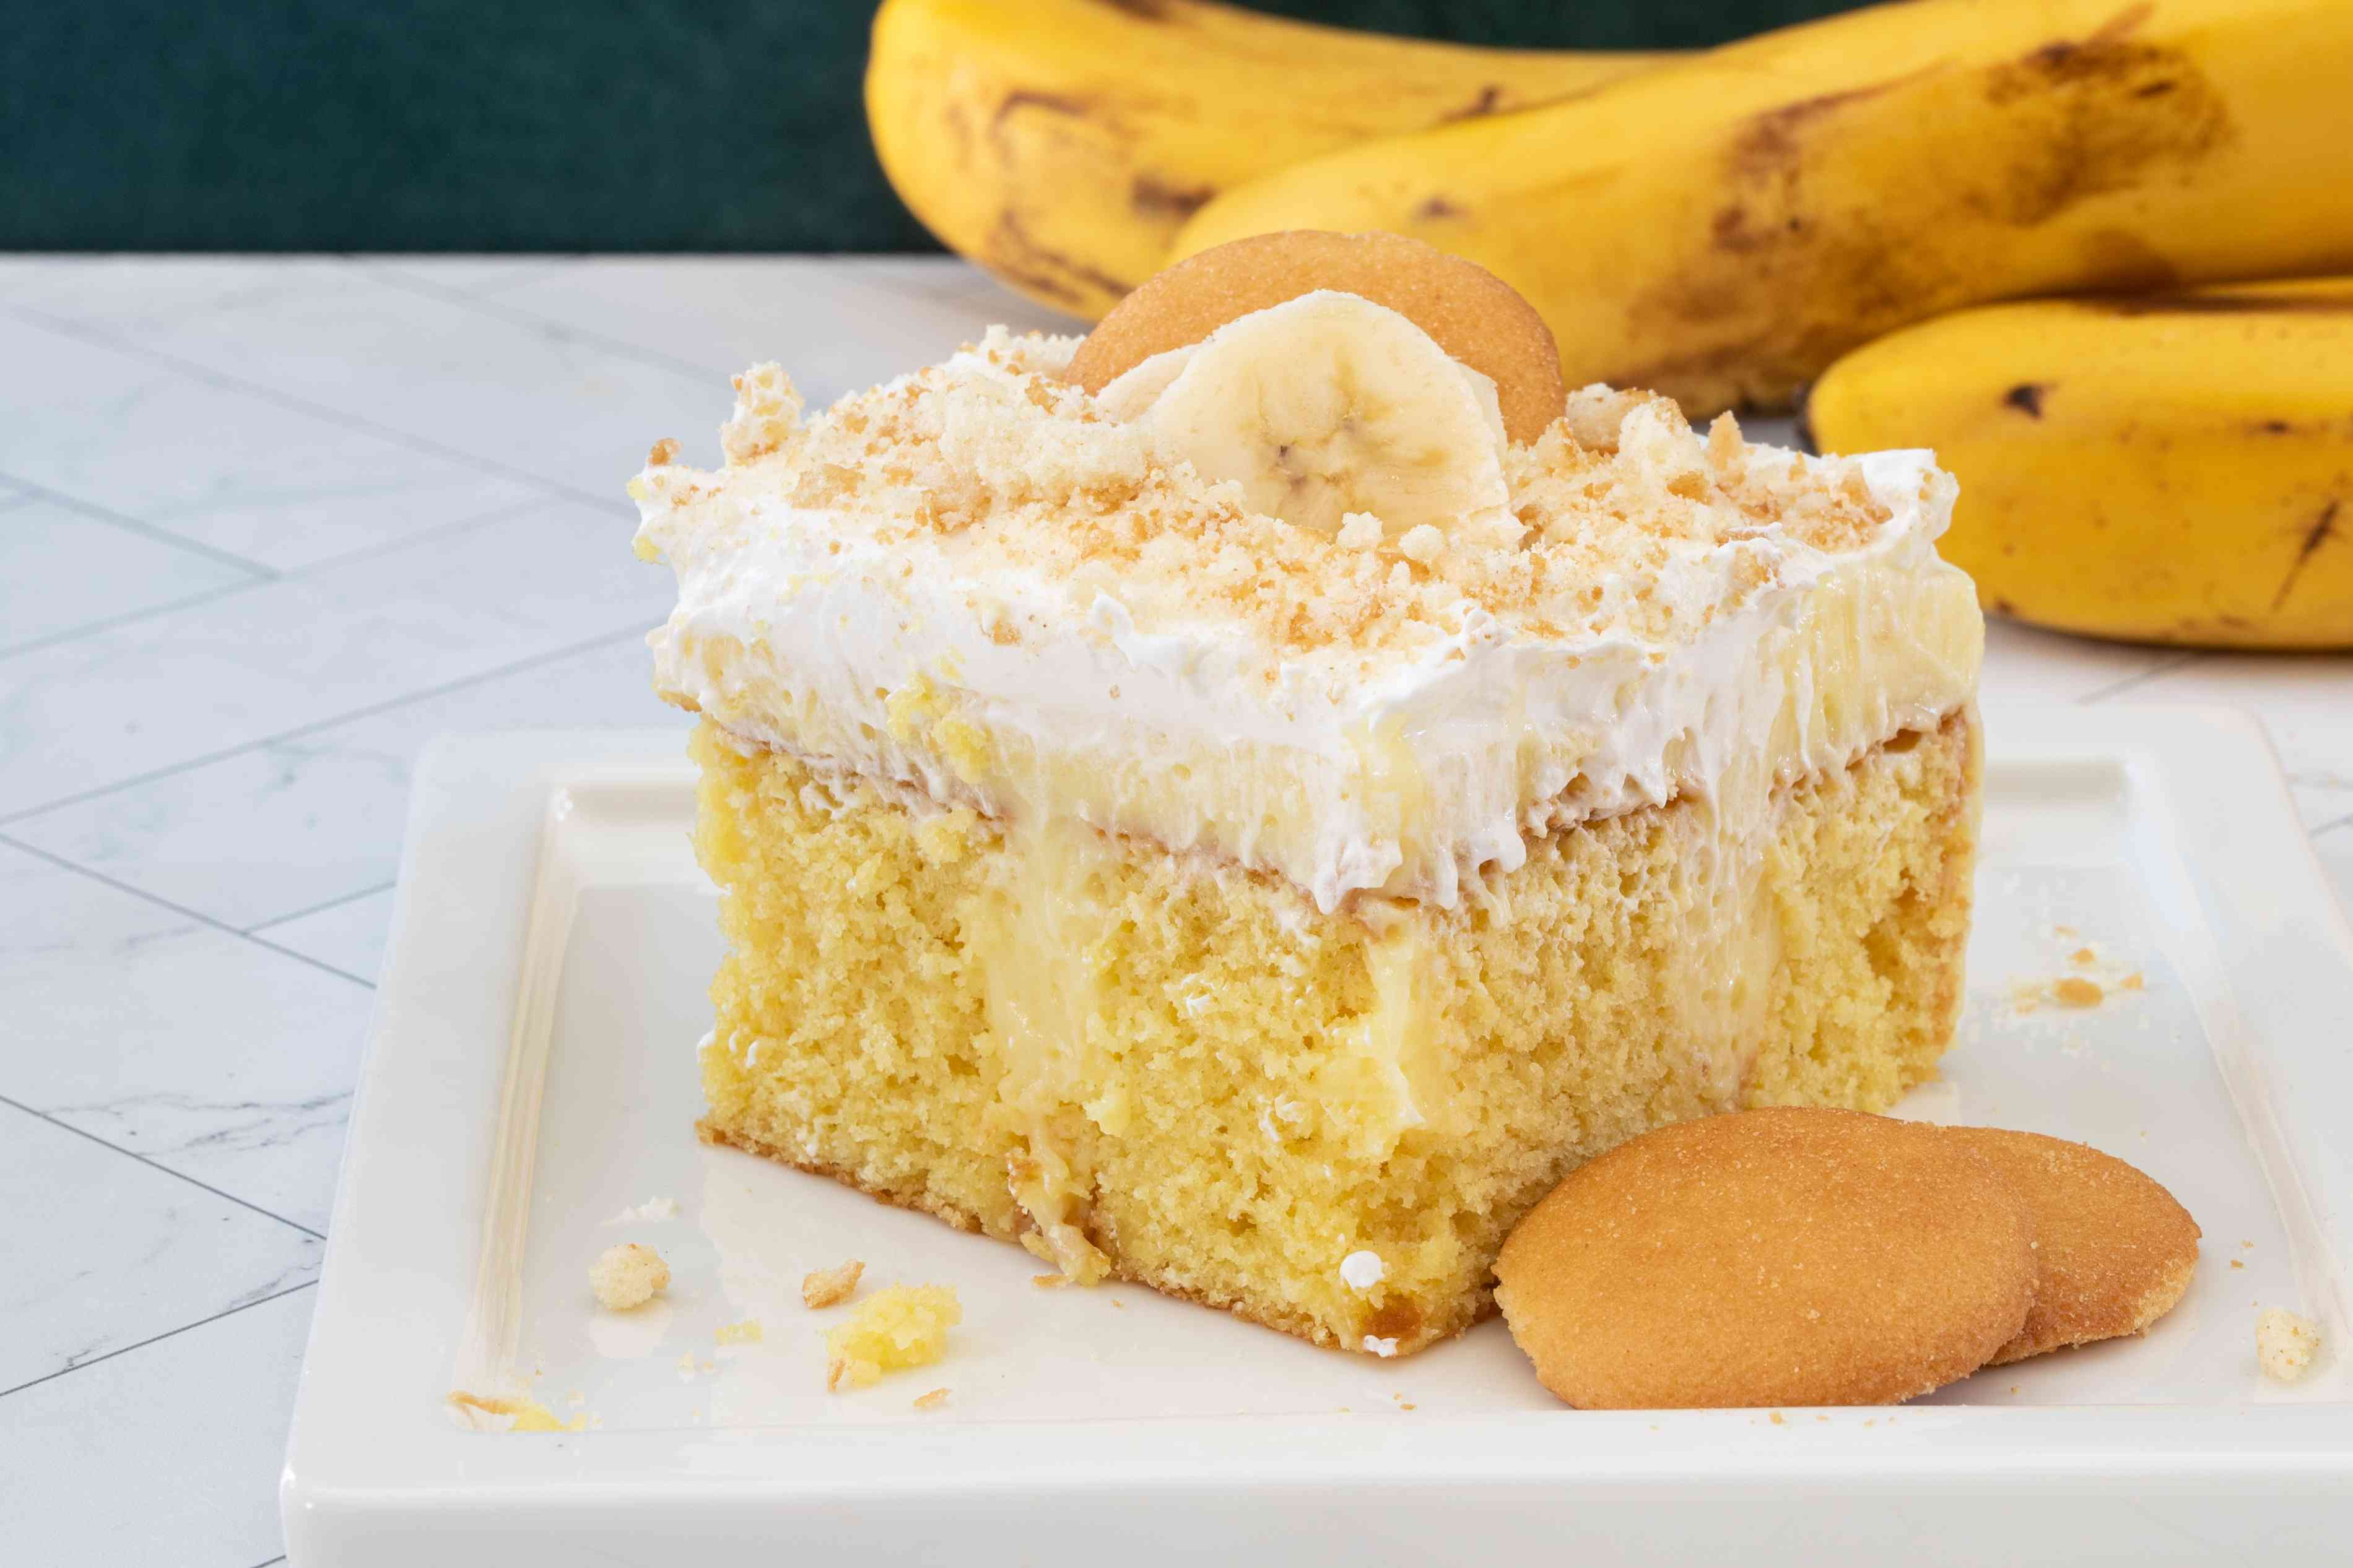 banana pudding poke cake on a plate